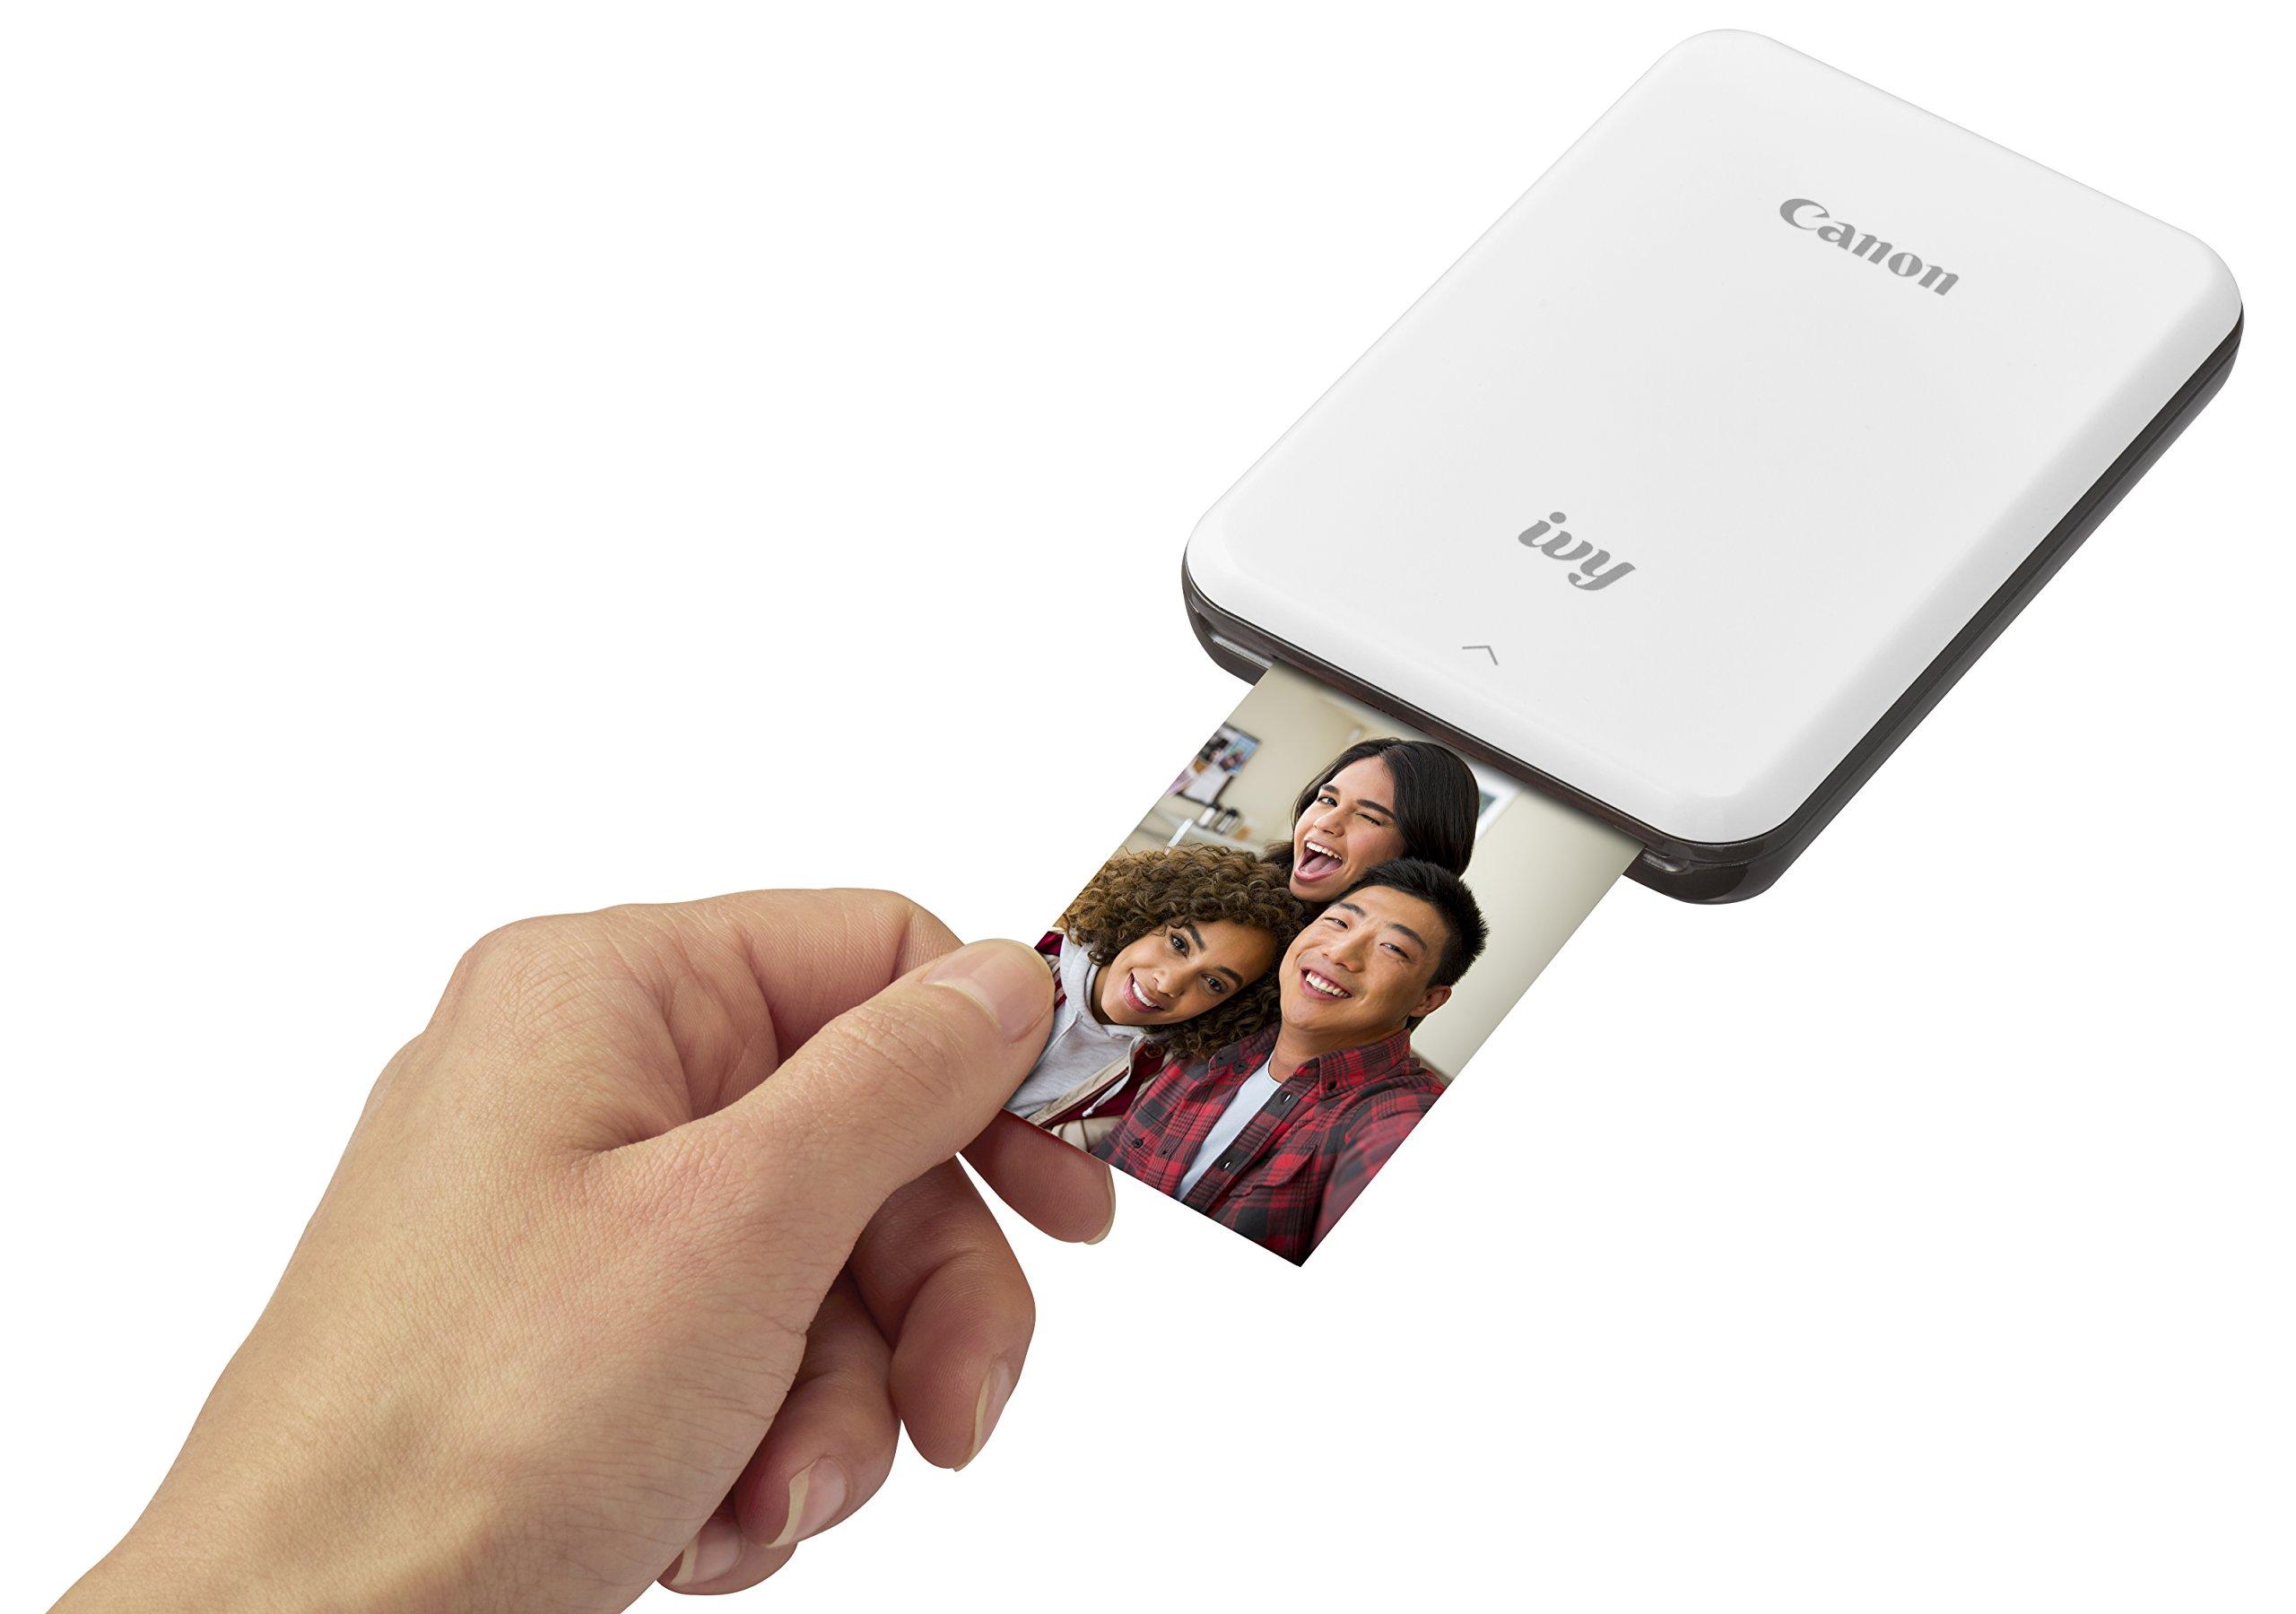 Canon IVY Mobile Mini Photo Printer through Bluetooth(R), Slate Gray by Canon (Image #2)